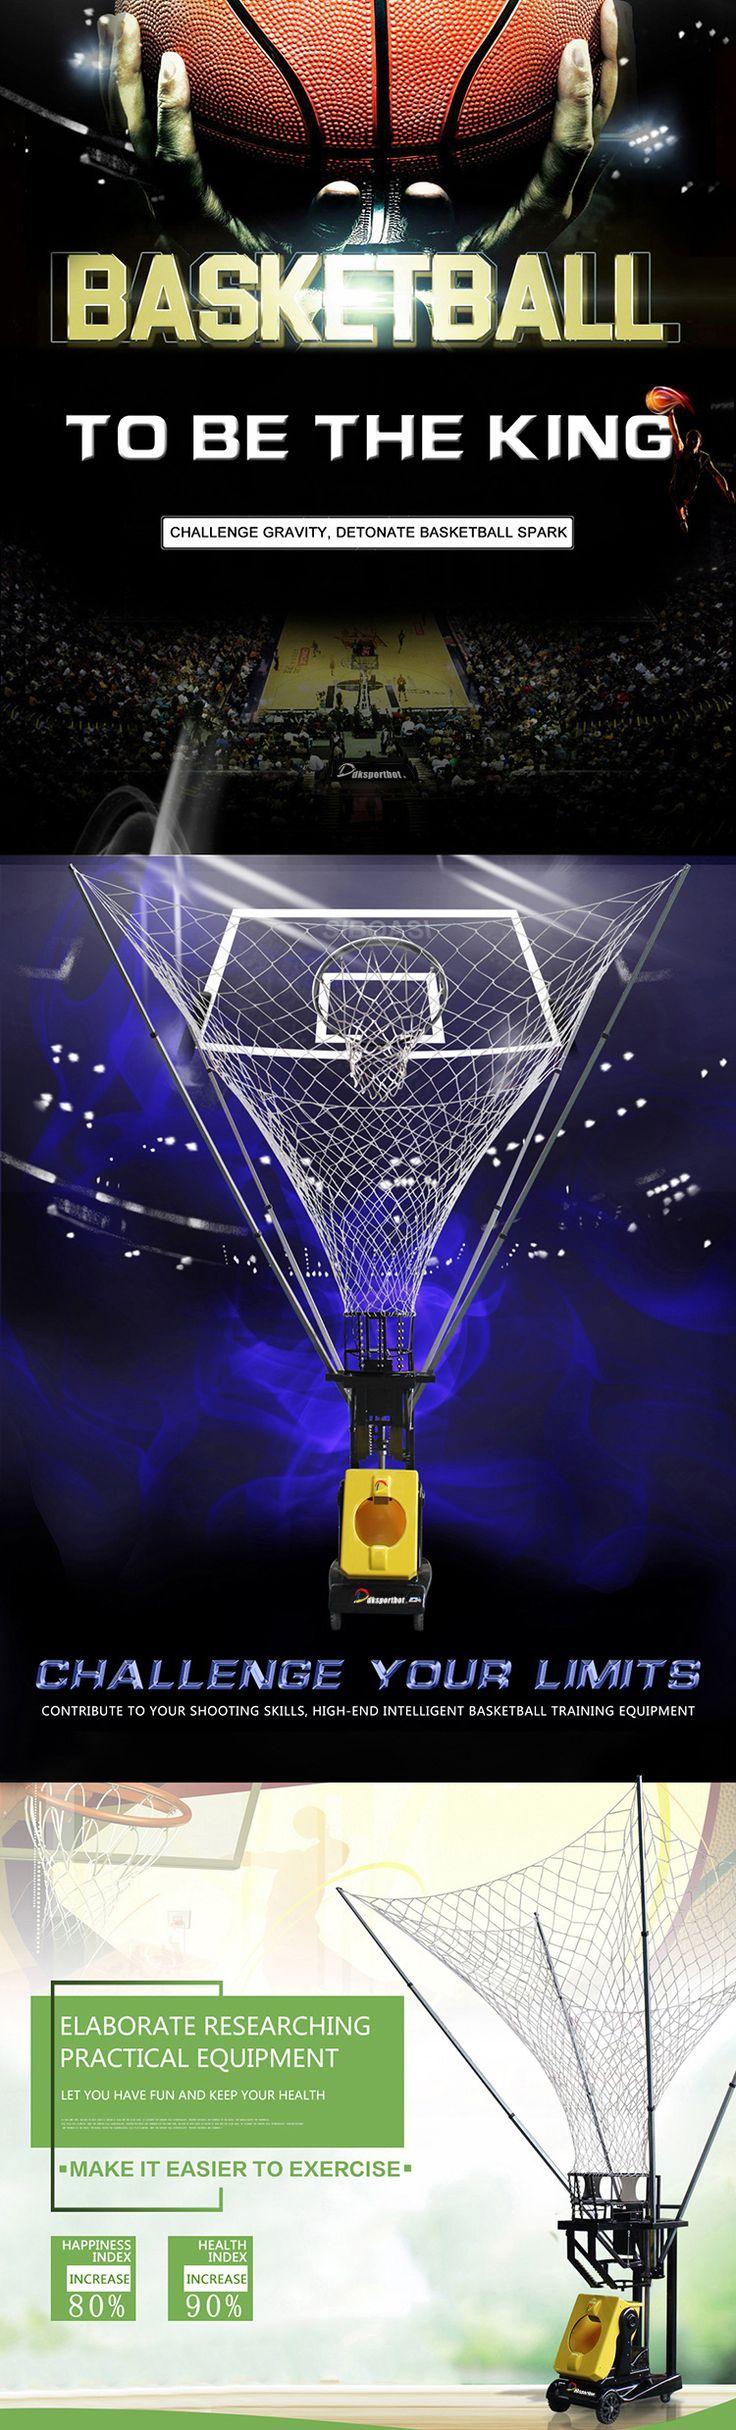 DKsportbot DL1 Basketball Training Machine #nice #good #basketball #basketballtime #basketballtraining #trainingmachine